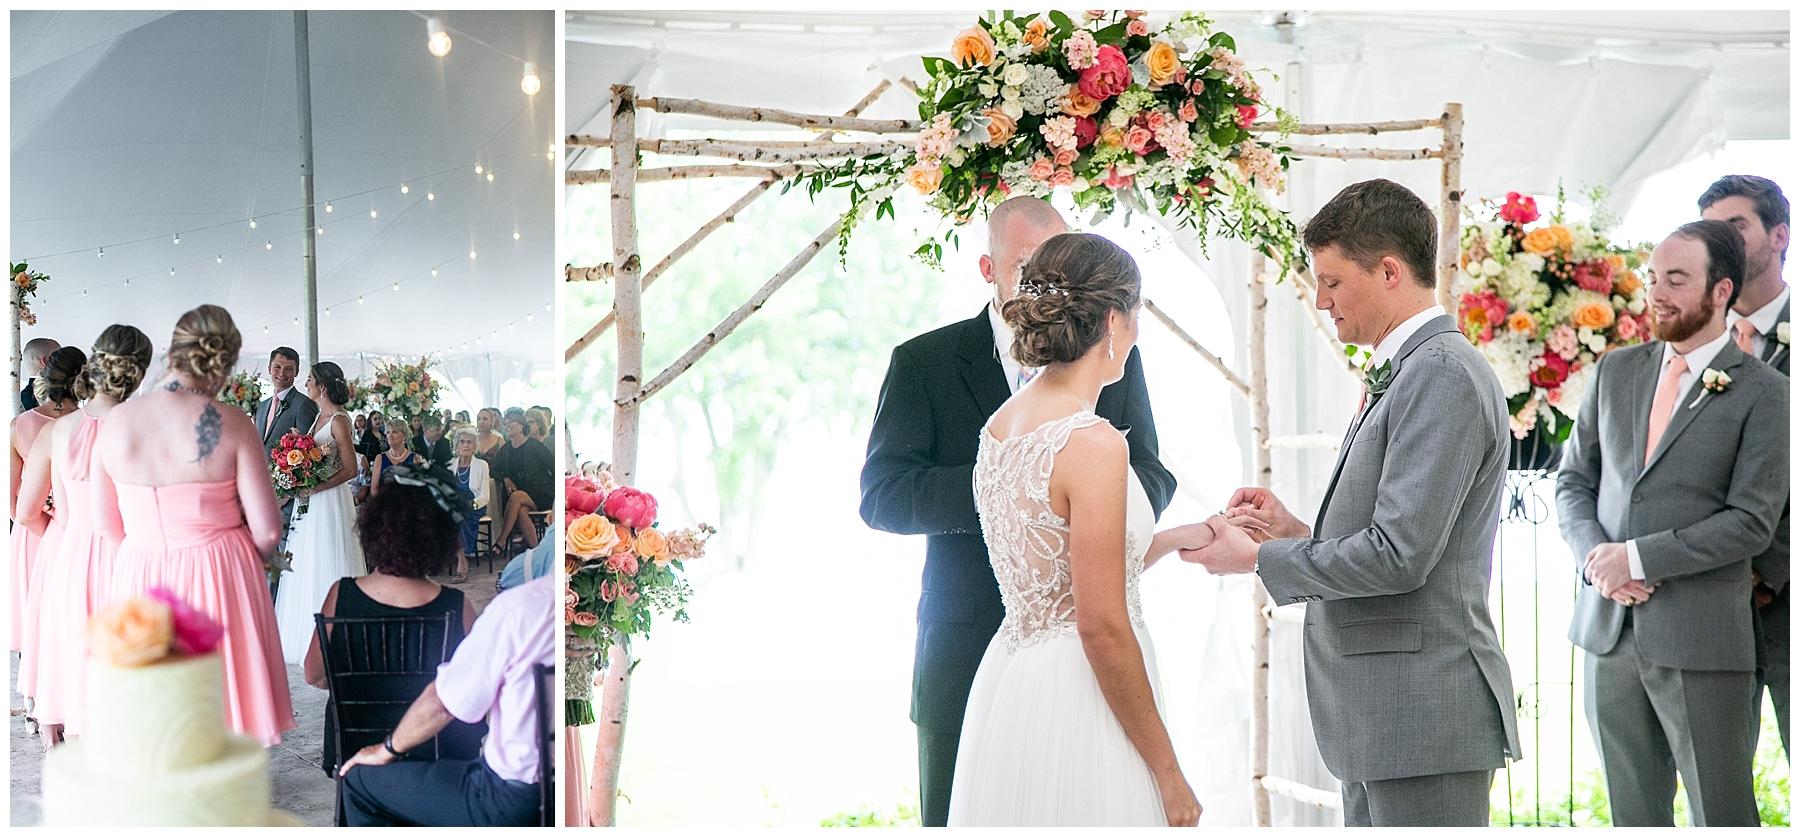 Chelsea Phil Bohemia River Overlook Wedding Living Radiant Photography photos_0109.jpg